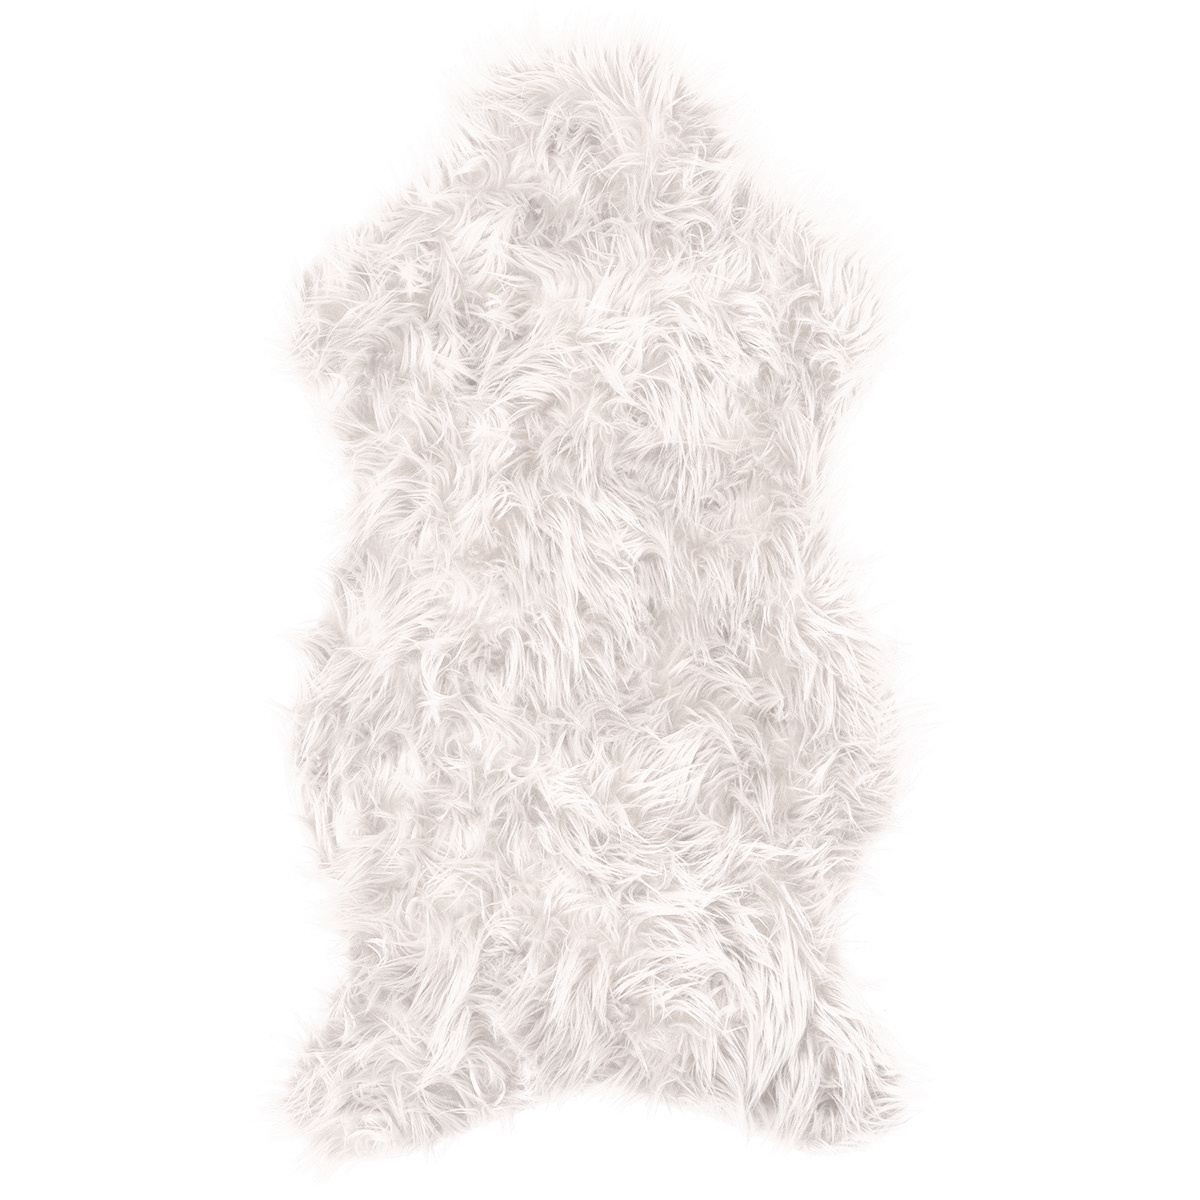 Koopman Kožešina béžová, 50 x 90 cm